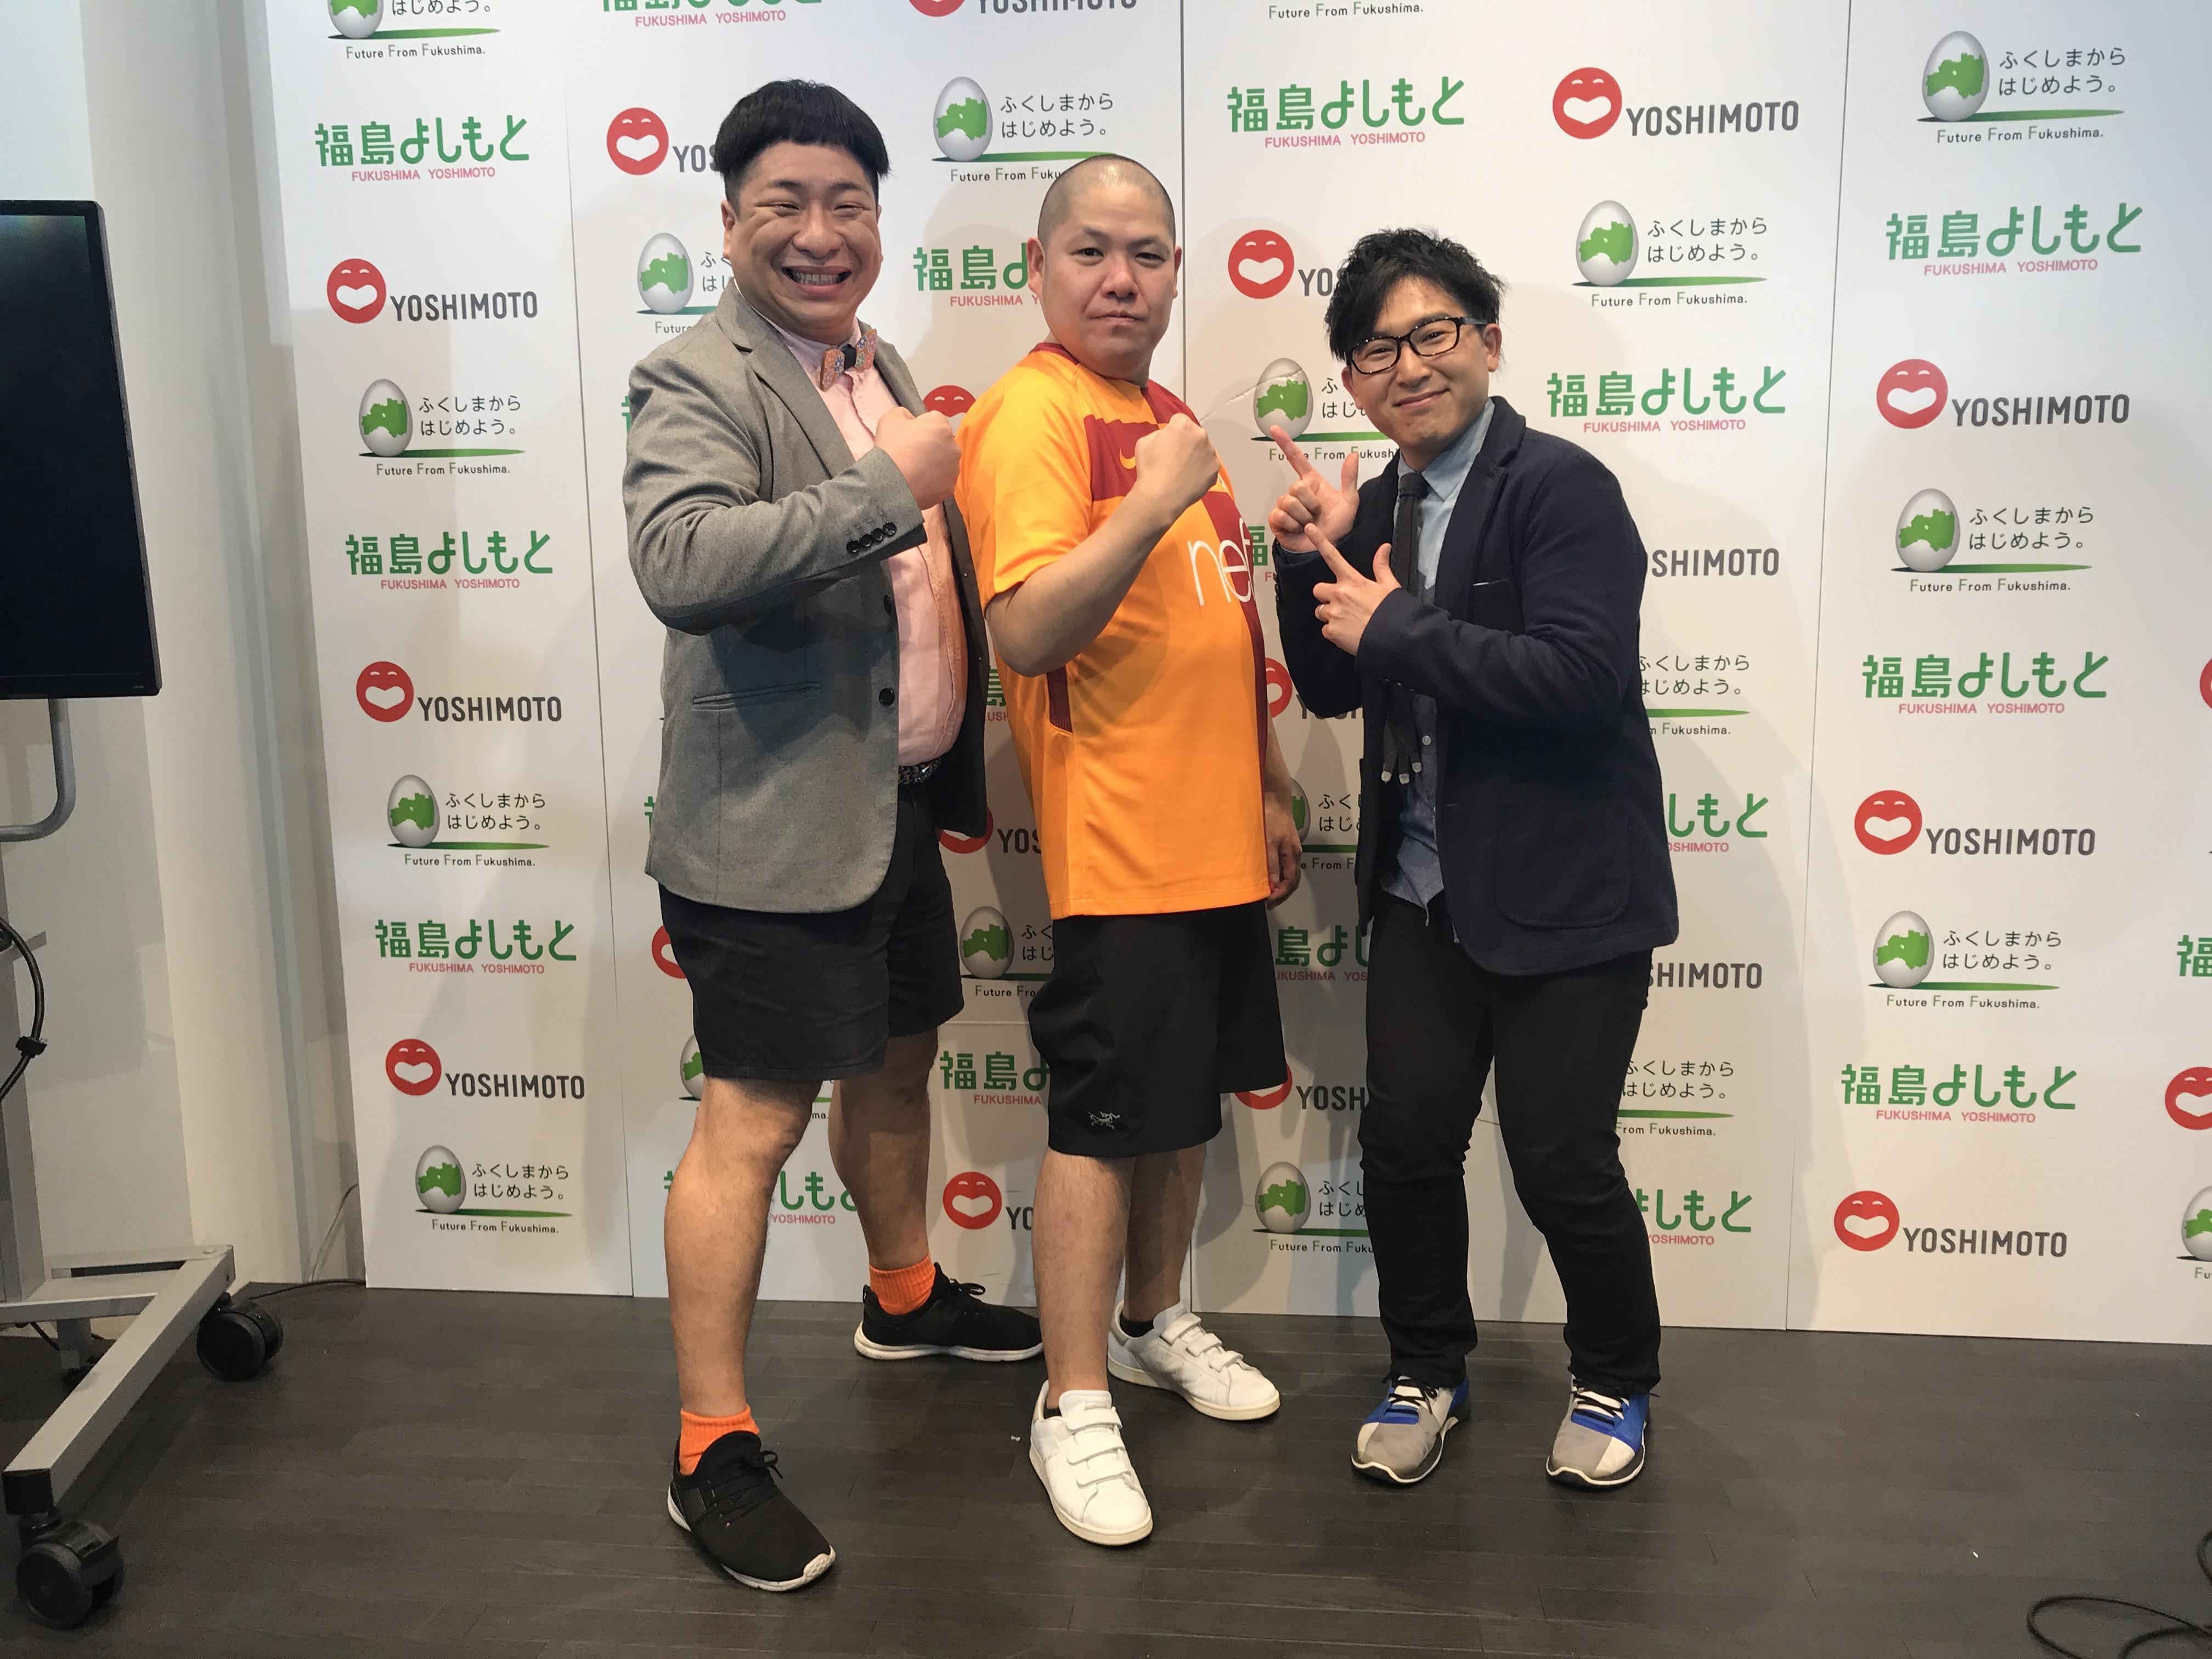 http://news.yoshimoto.co.jp/20180306182647-2690ee99212ac58a802011bed8541050dc6a801c.jpg